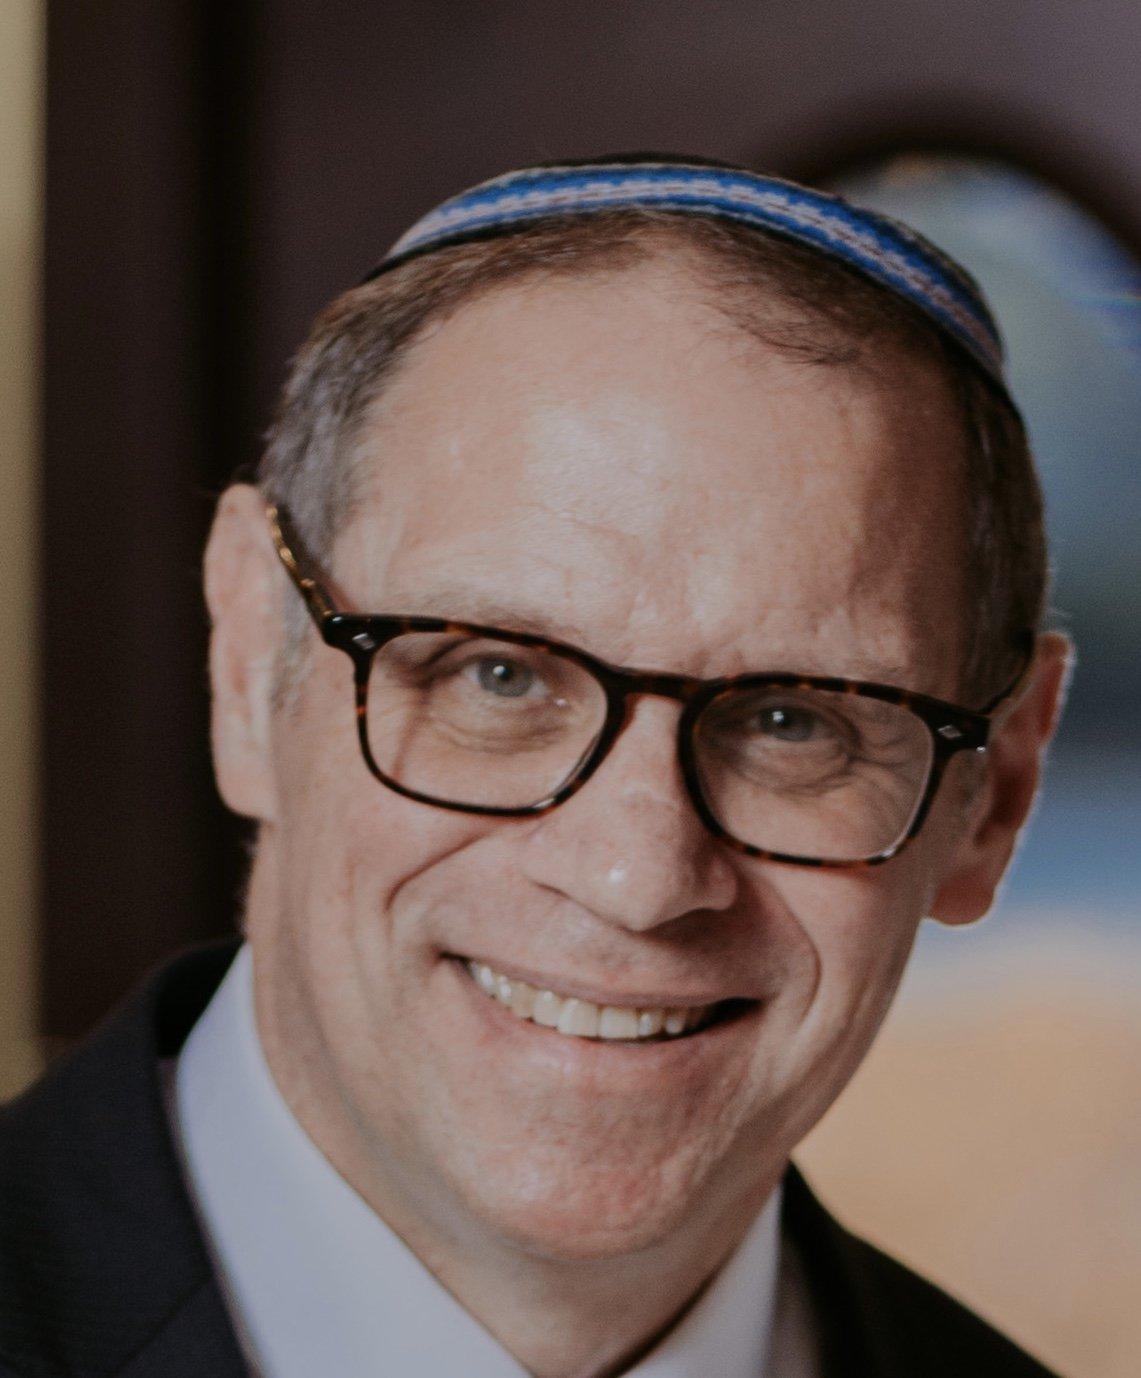 Rabbi Mark Dratch